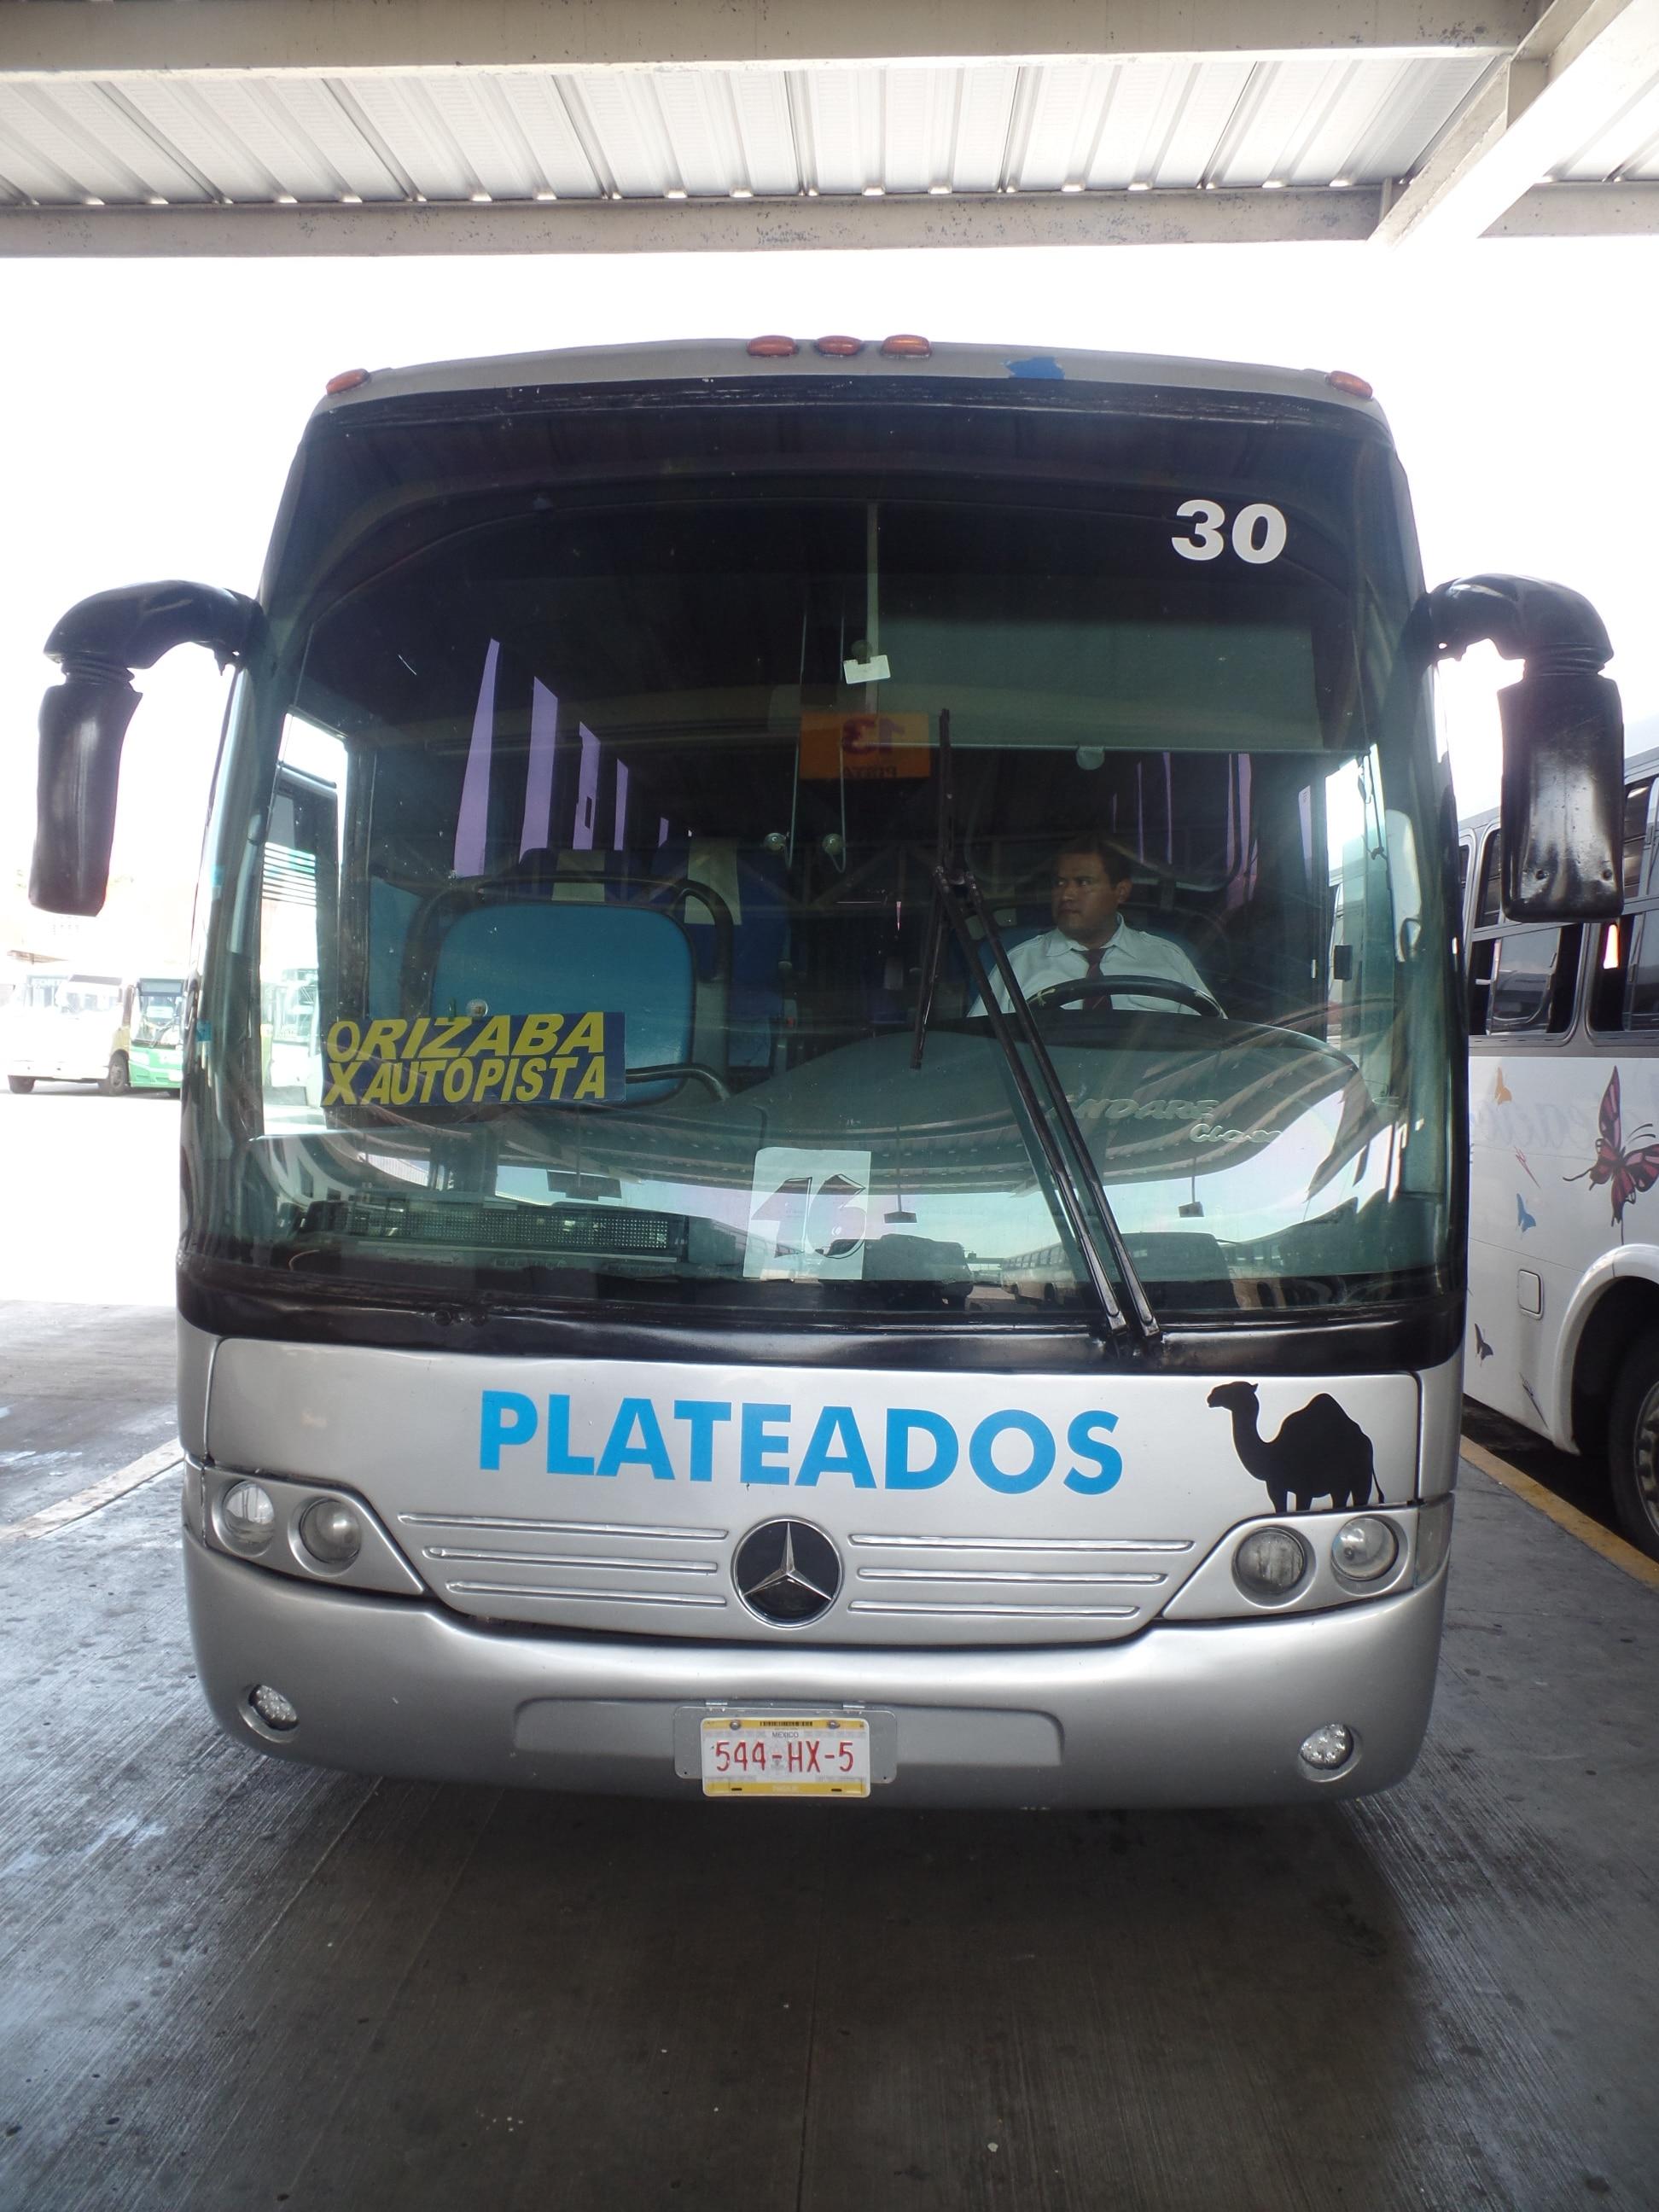 "Mercedes Benz Marcopolo Andare Class, Autotransportes de Córdoba, S.A. de C.V. ""Plateados"""